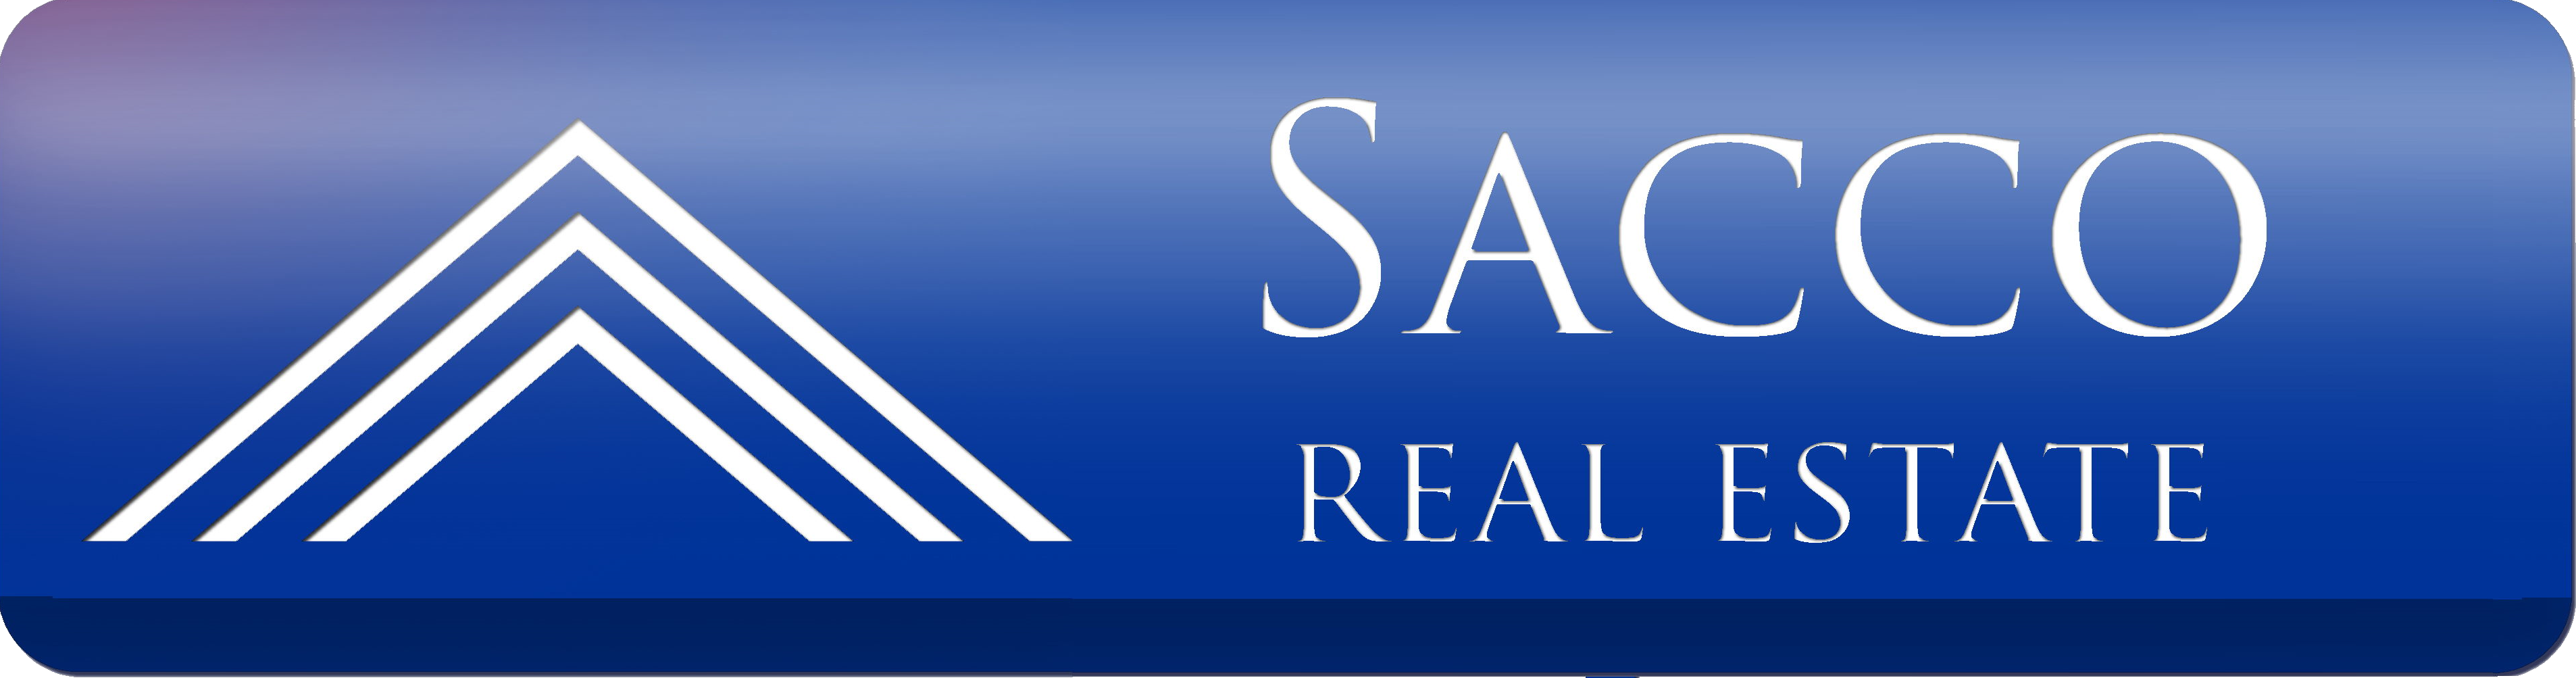 Sacco Real Estate